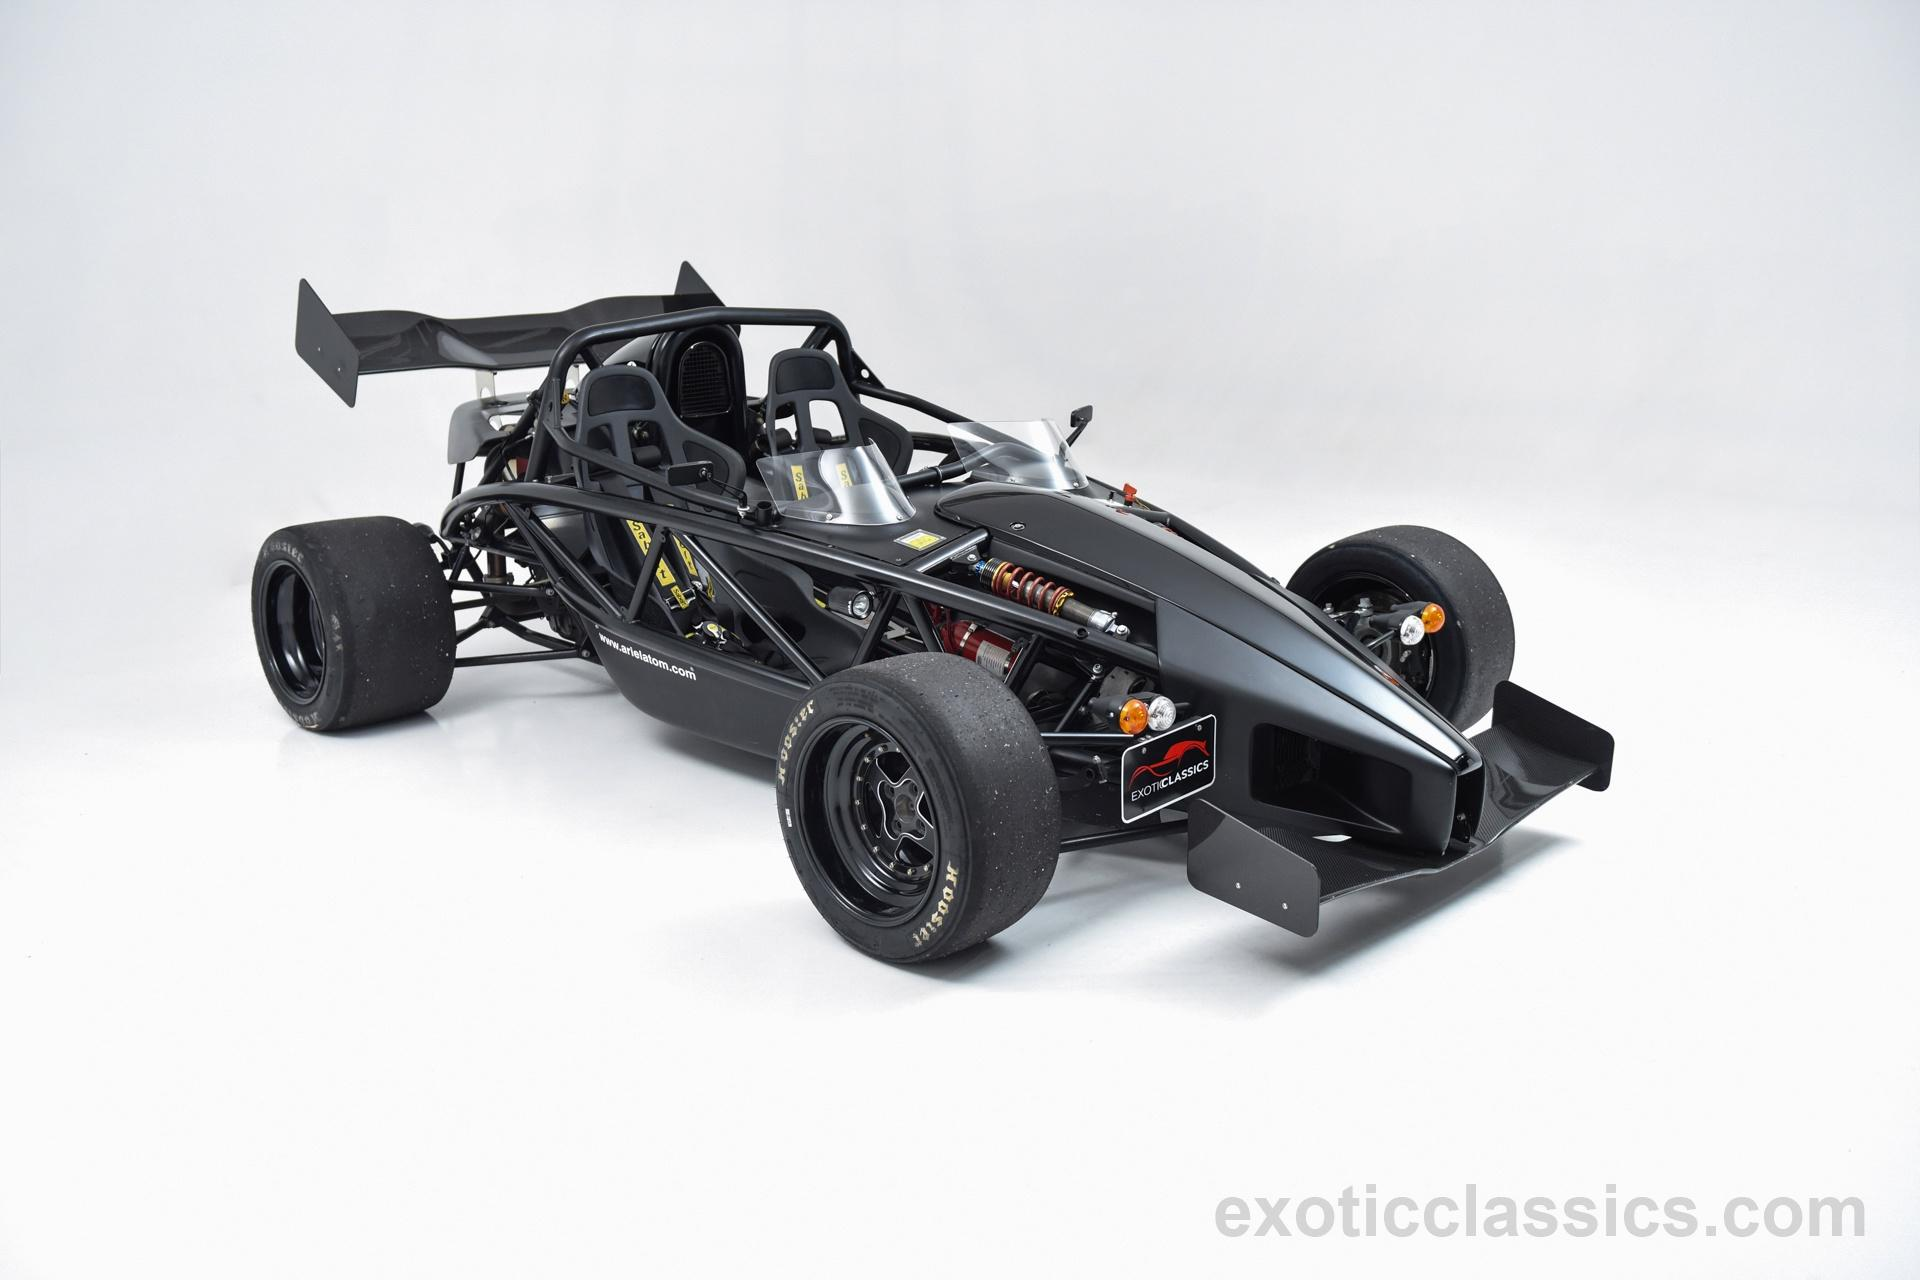 2009 Ariel Atom 3 - Champion Motors International l Exotic Classic ...